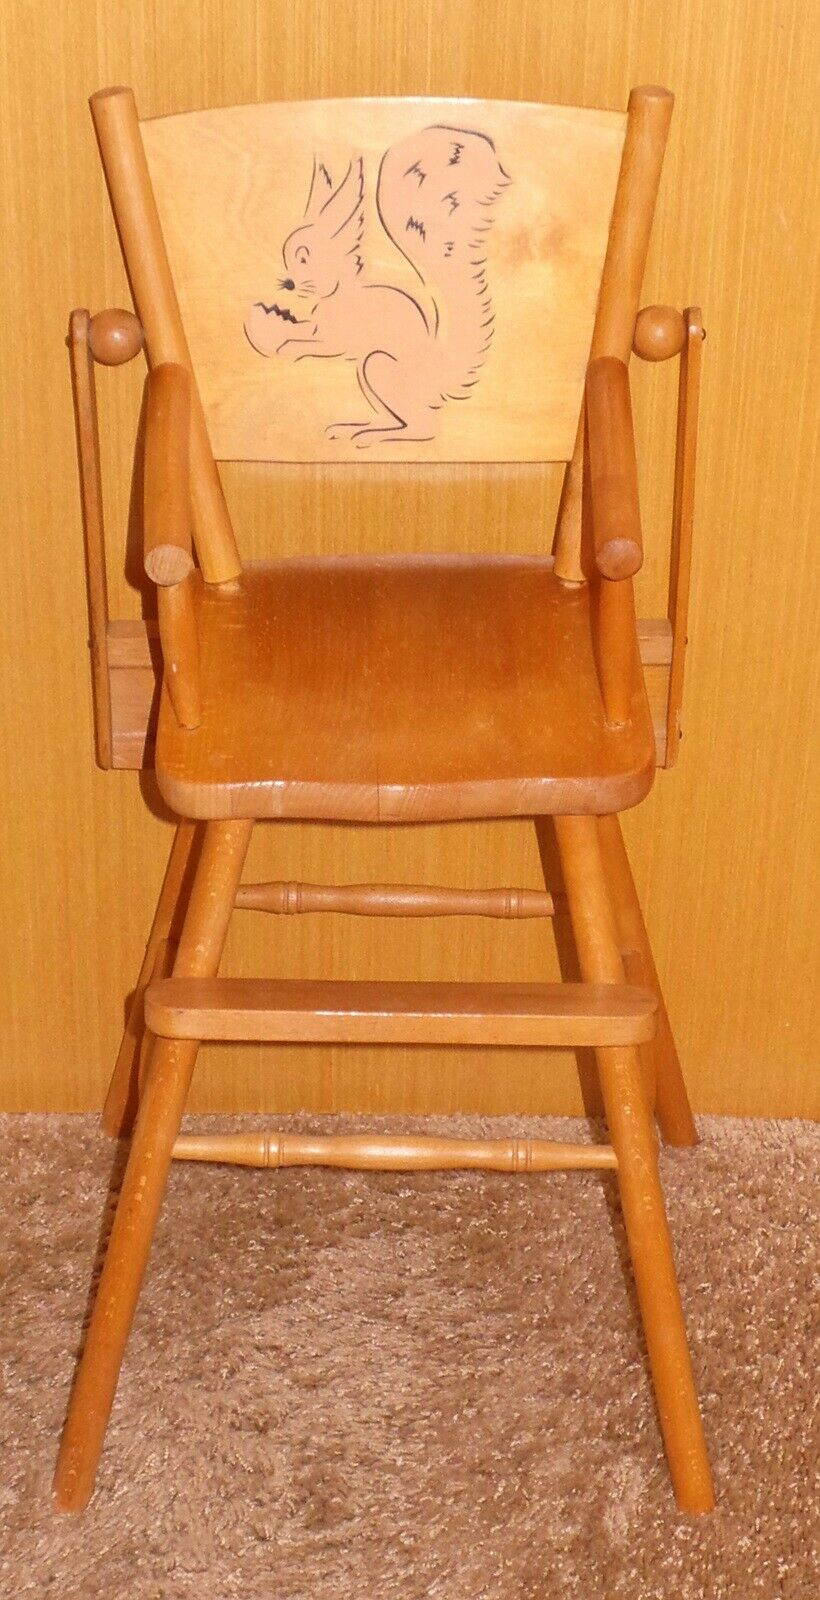 Dukkemøbler, Høj stol til dukker